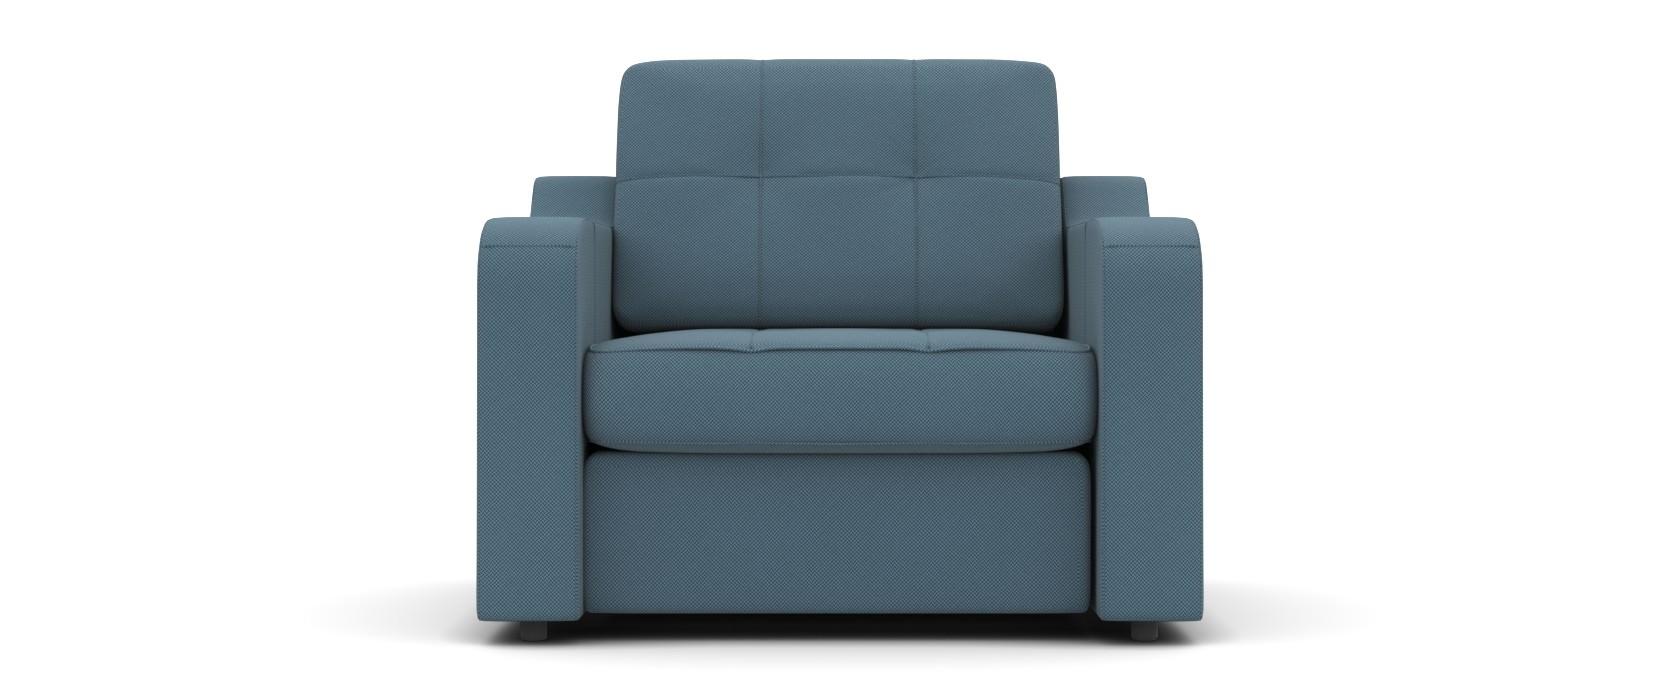 Раскладное кресло Vito